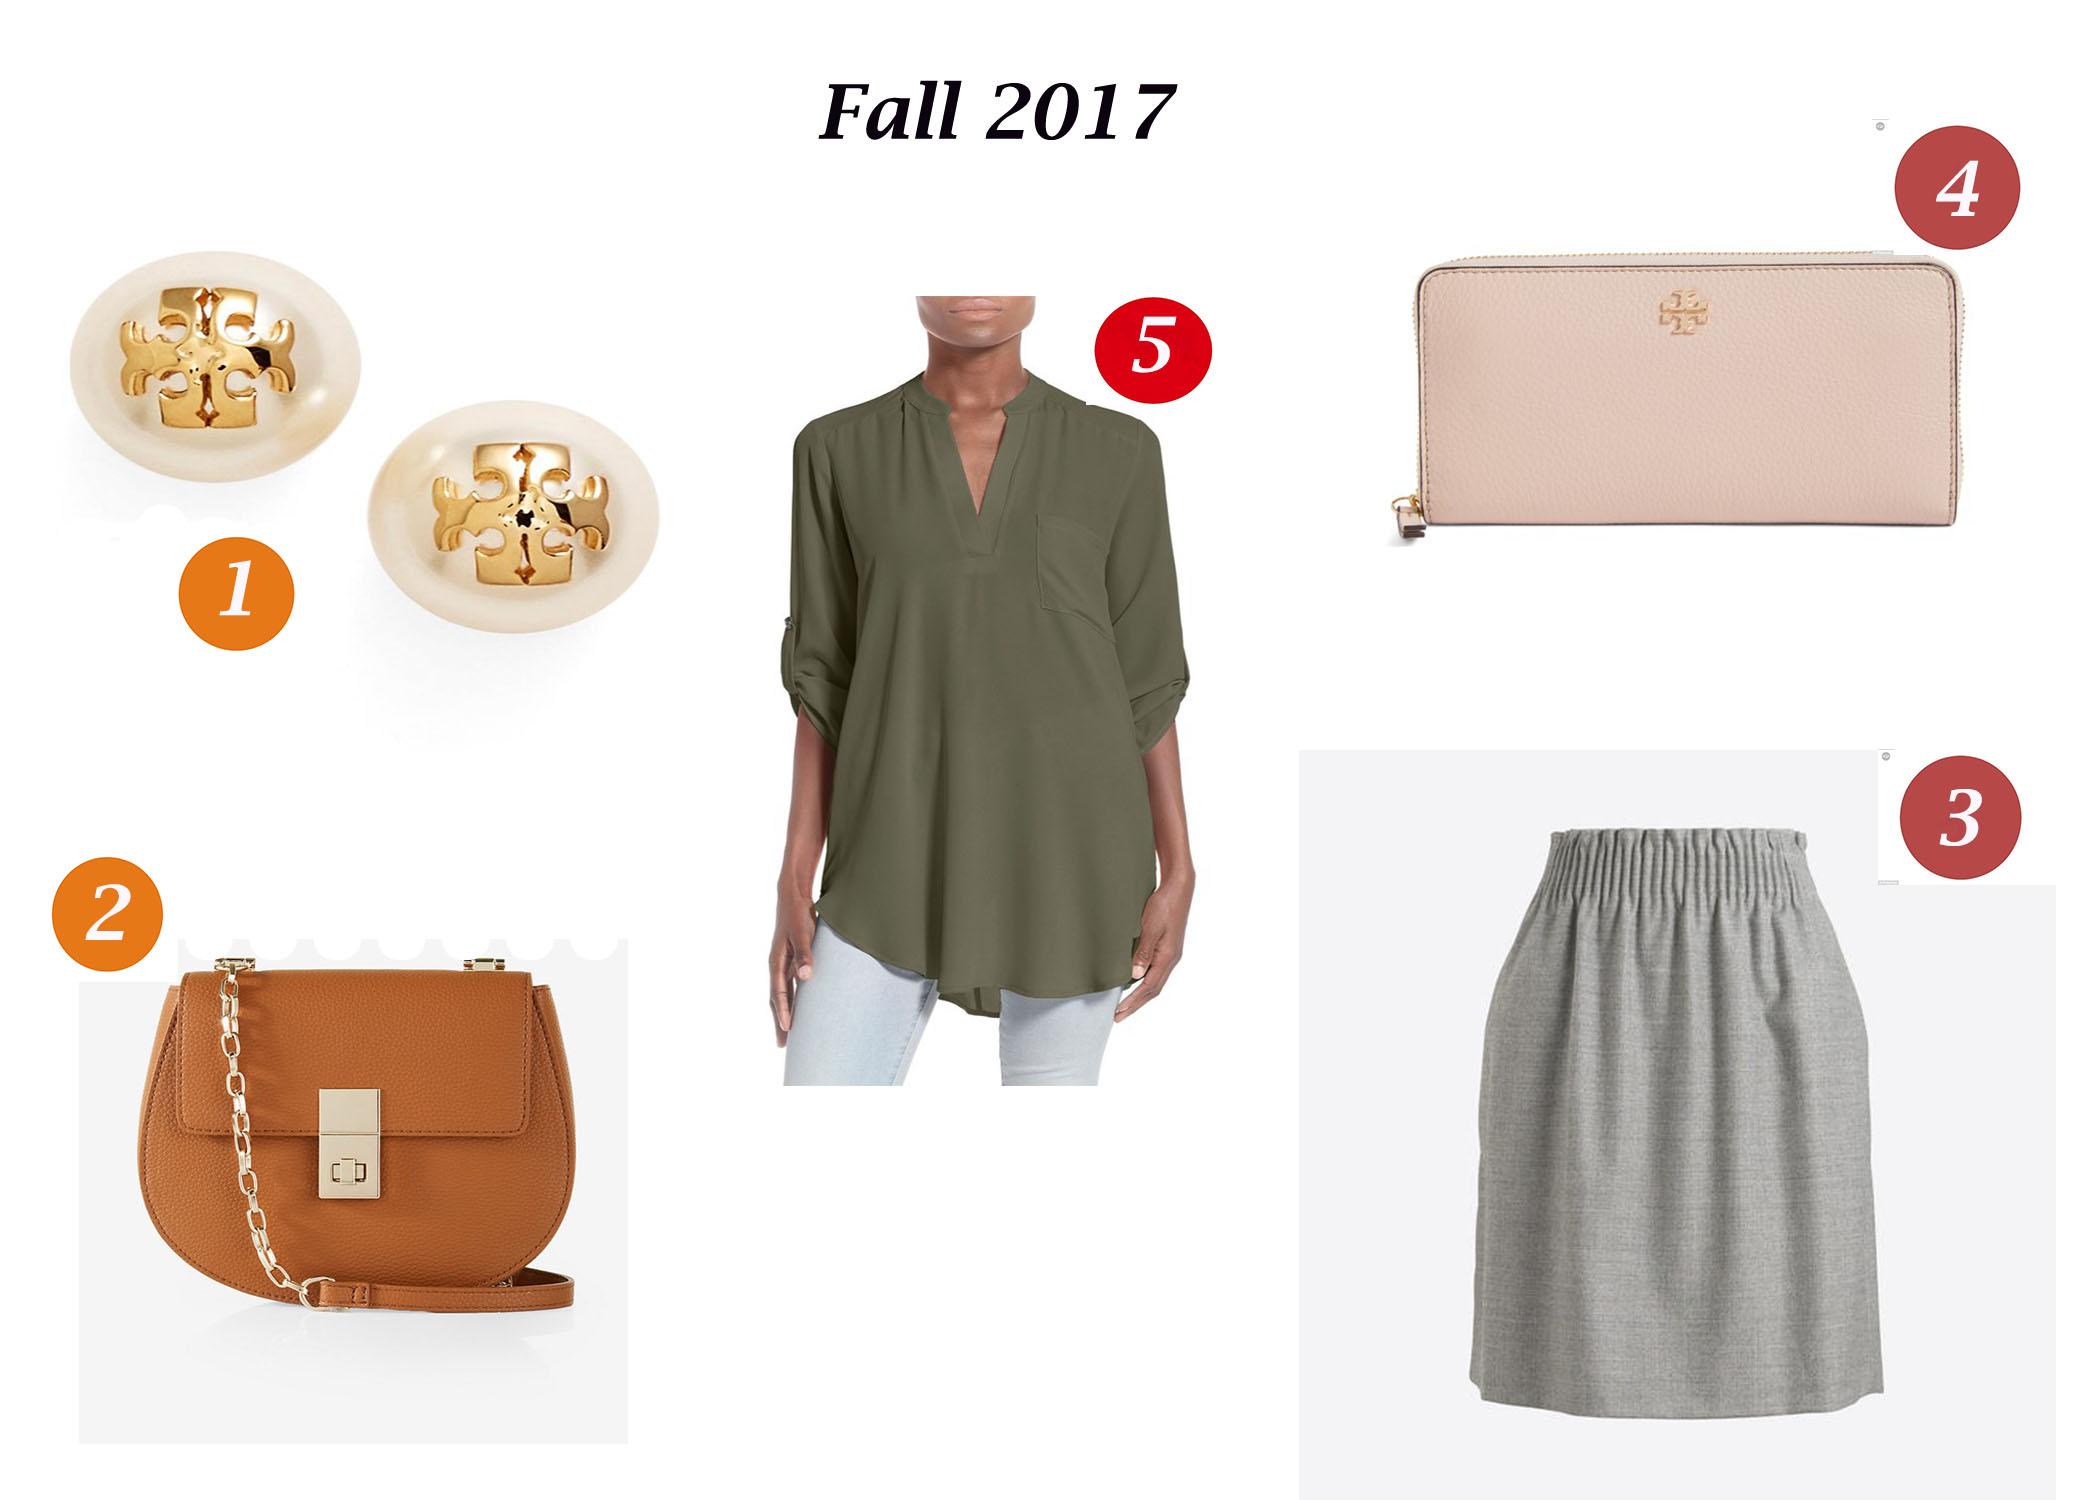 Craving Fall, Fall 2017, Tory Burch